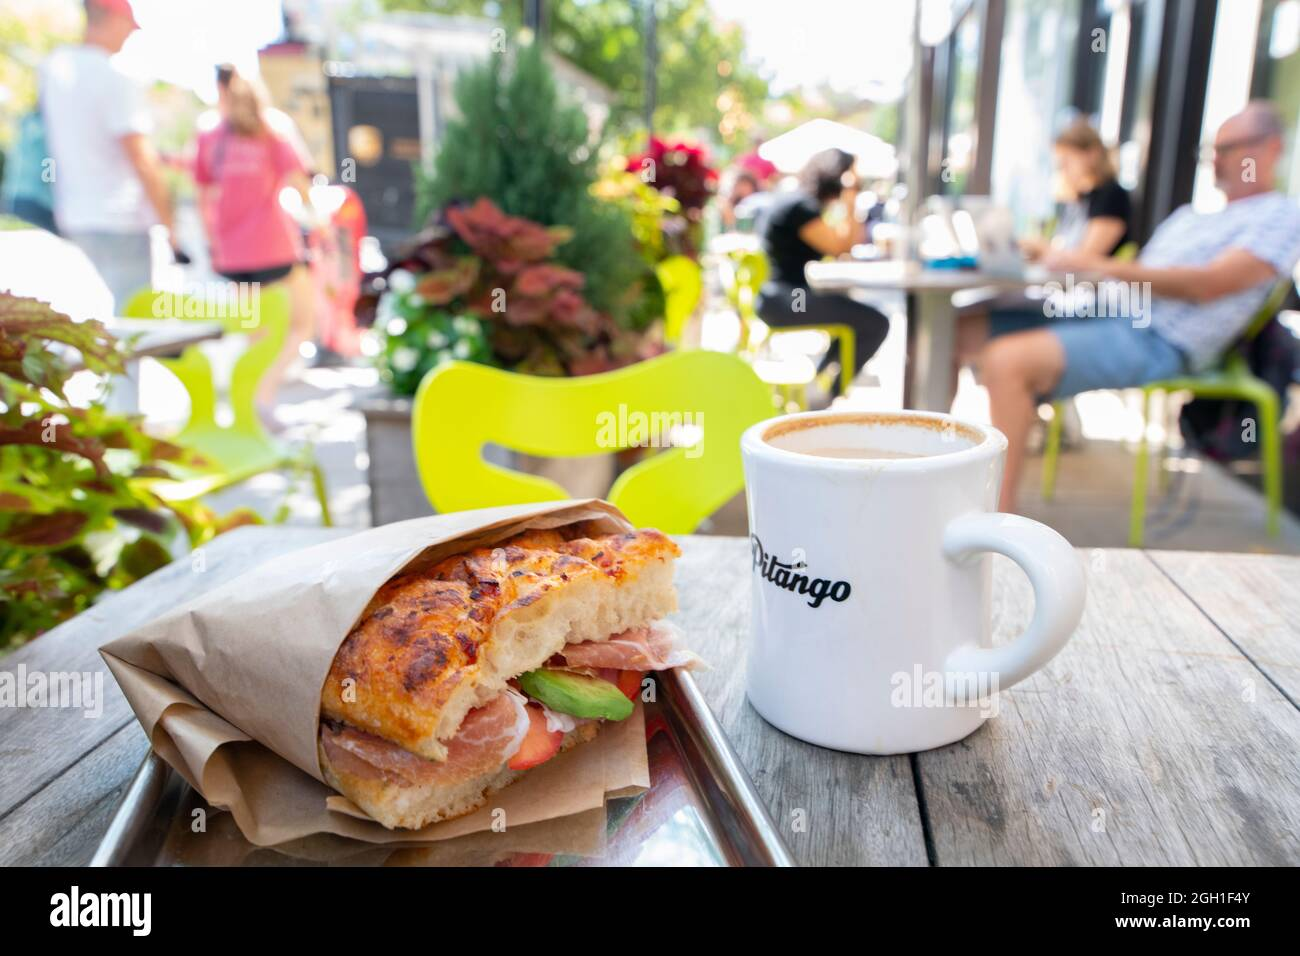 usa-washington-dc-food-focaccia-sandwich-at-pitango-bakery-cafe-in-adams-morgan-made-with-avocado-tomato-prosciutto-2GH1F4Y.jpg